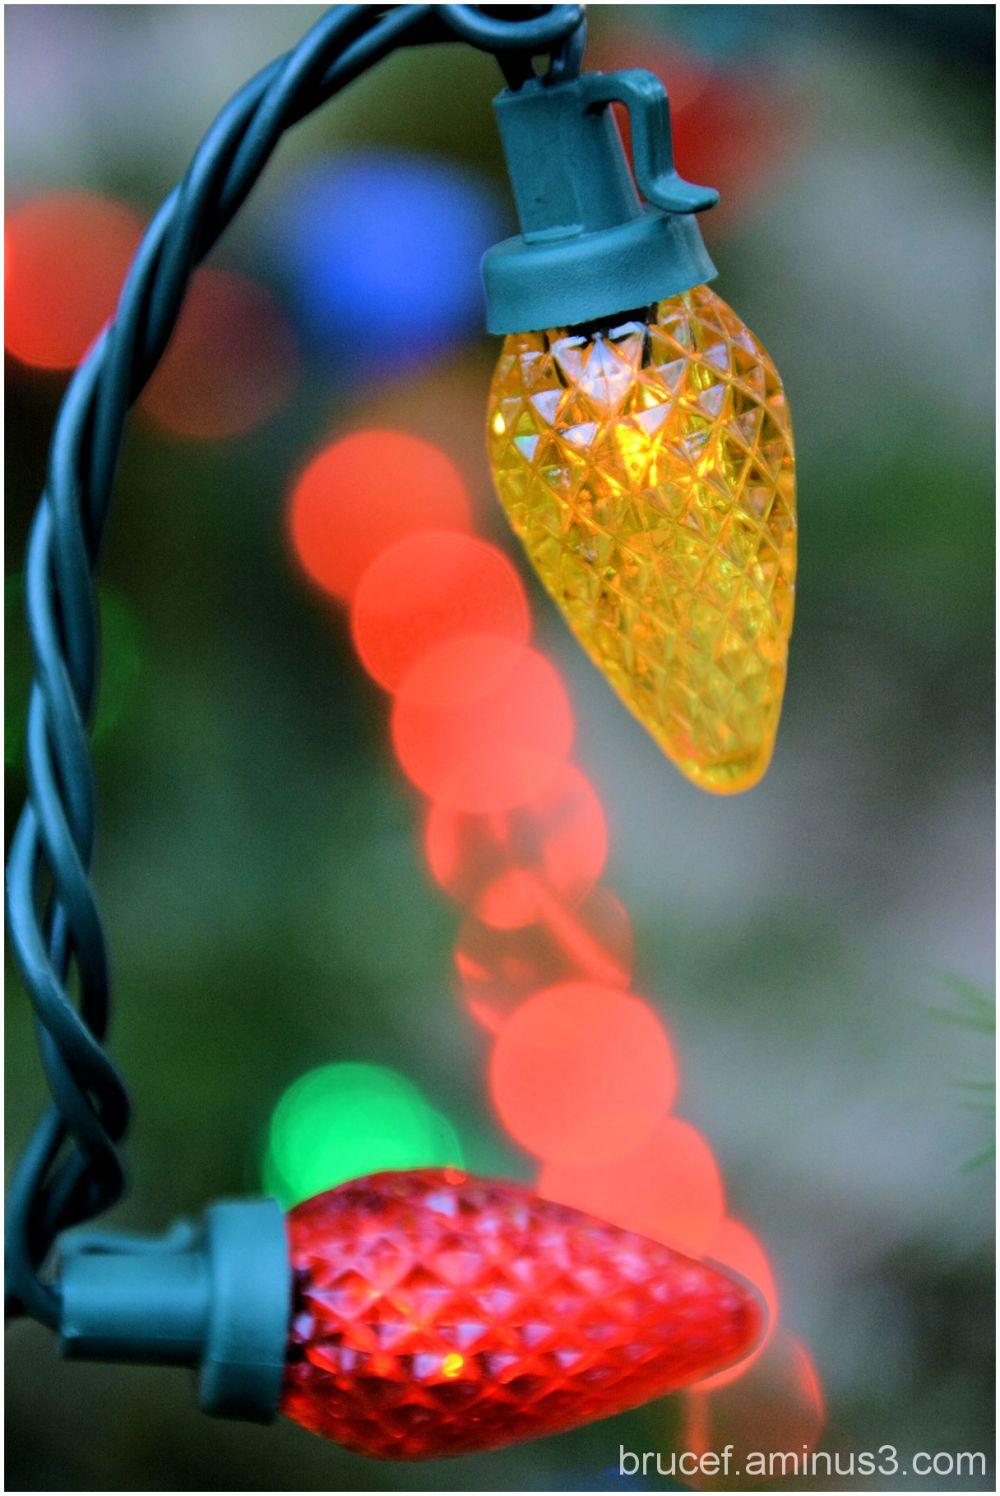 The lights of the Season